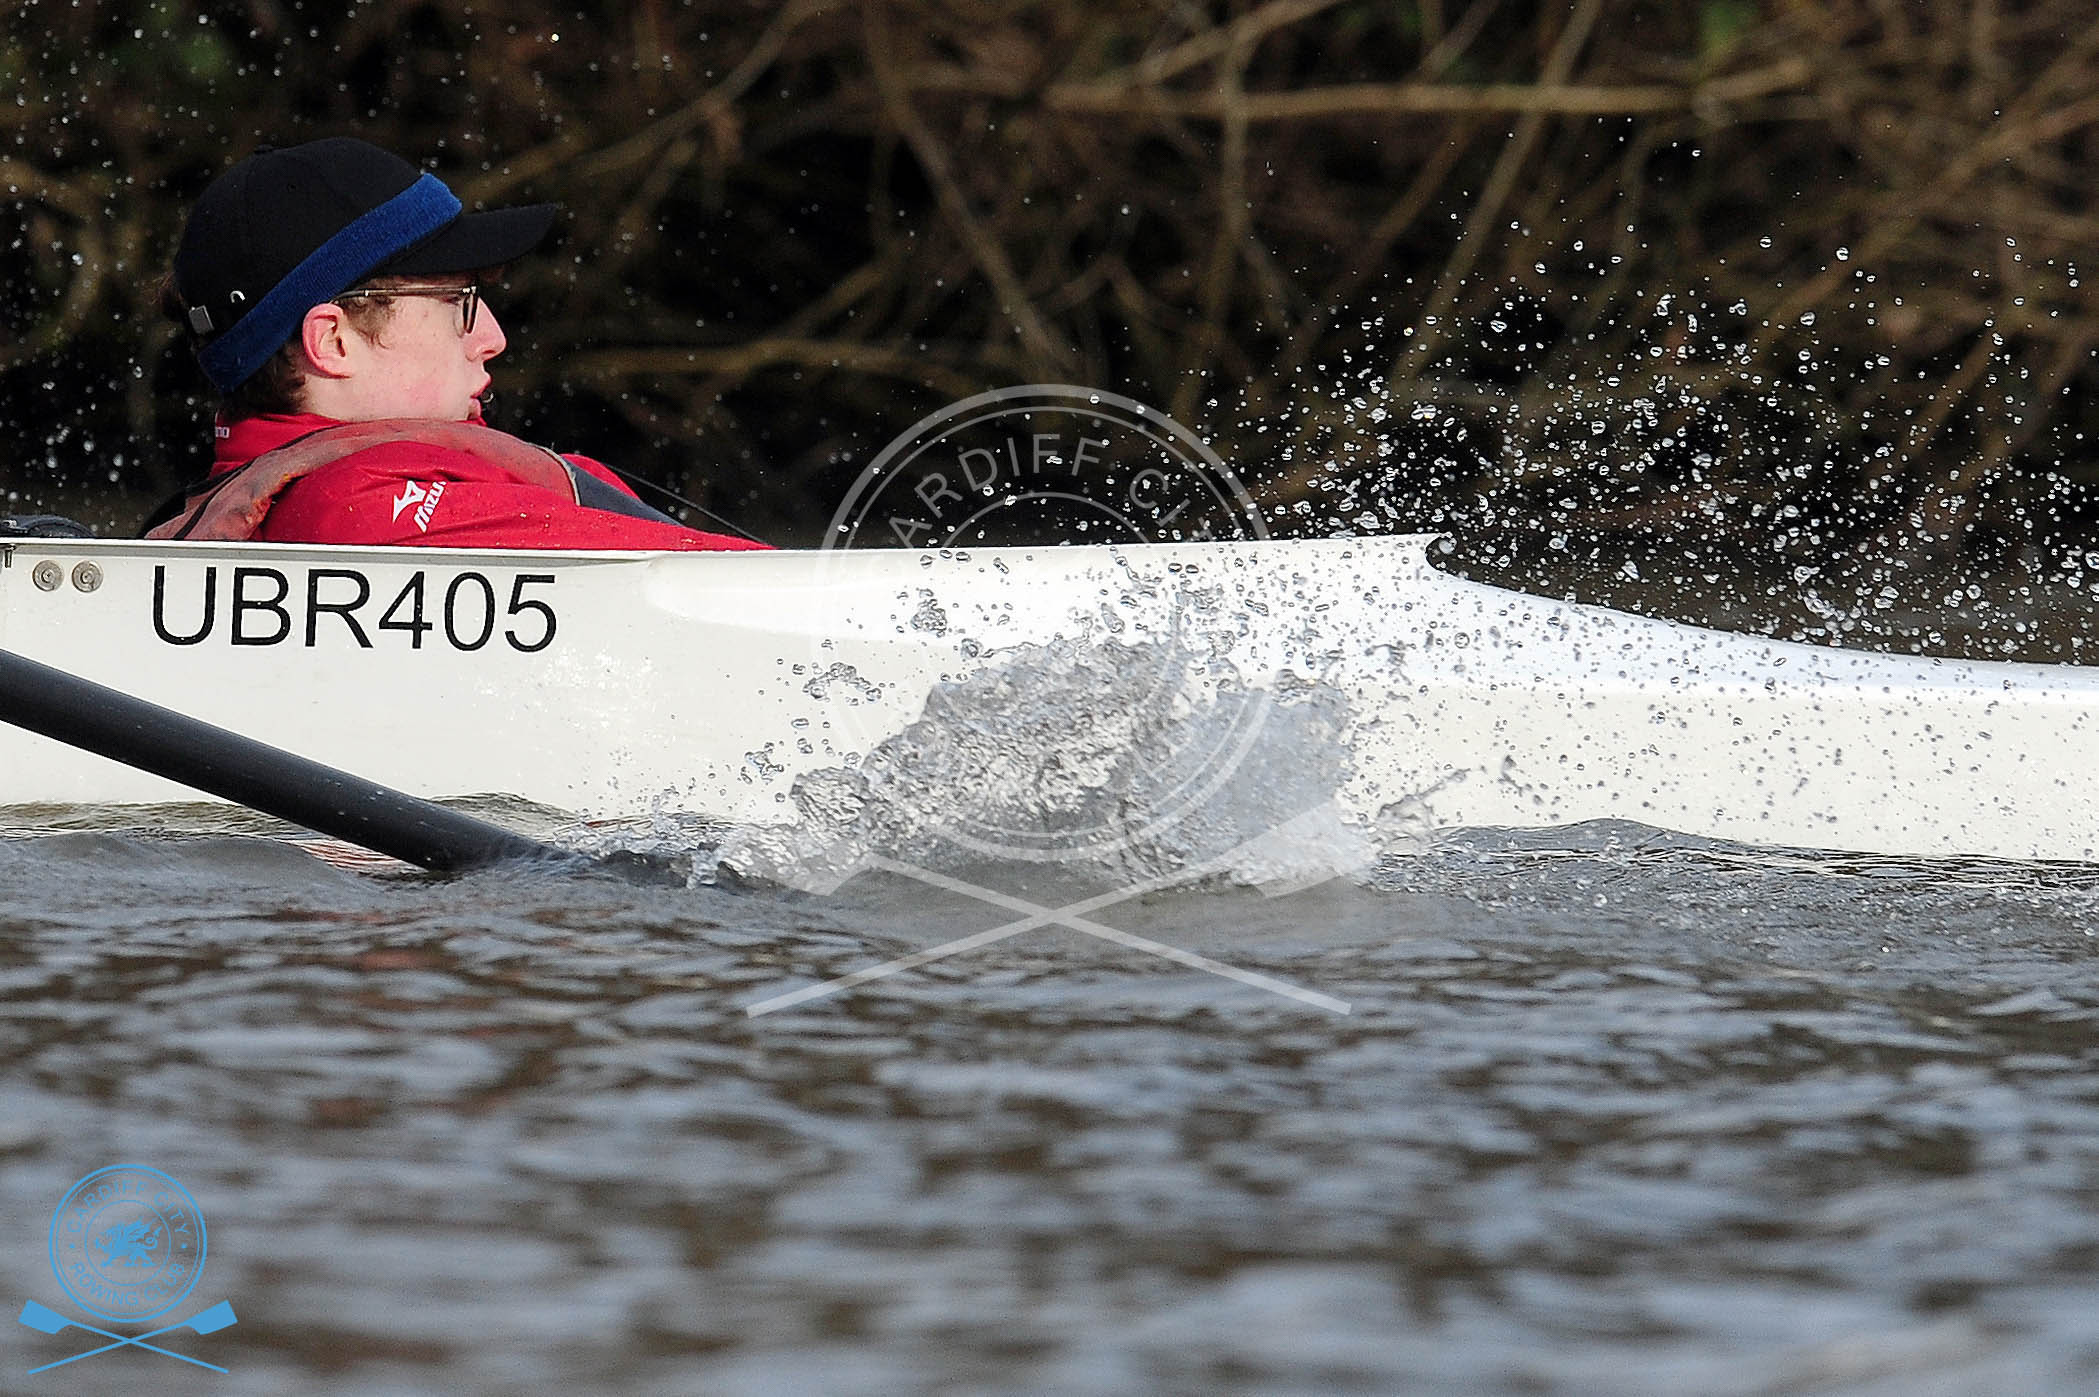 DW_280119_Cardiff_City_Rowing_272.jpg